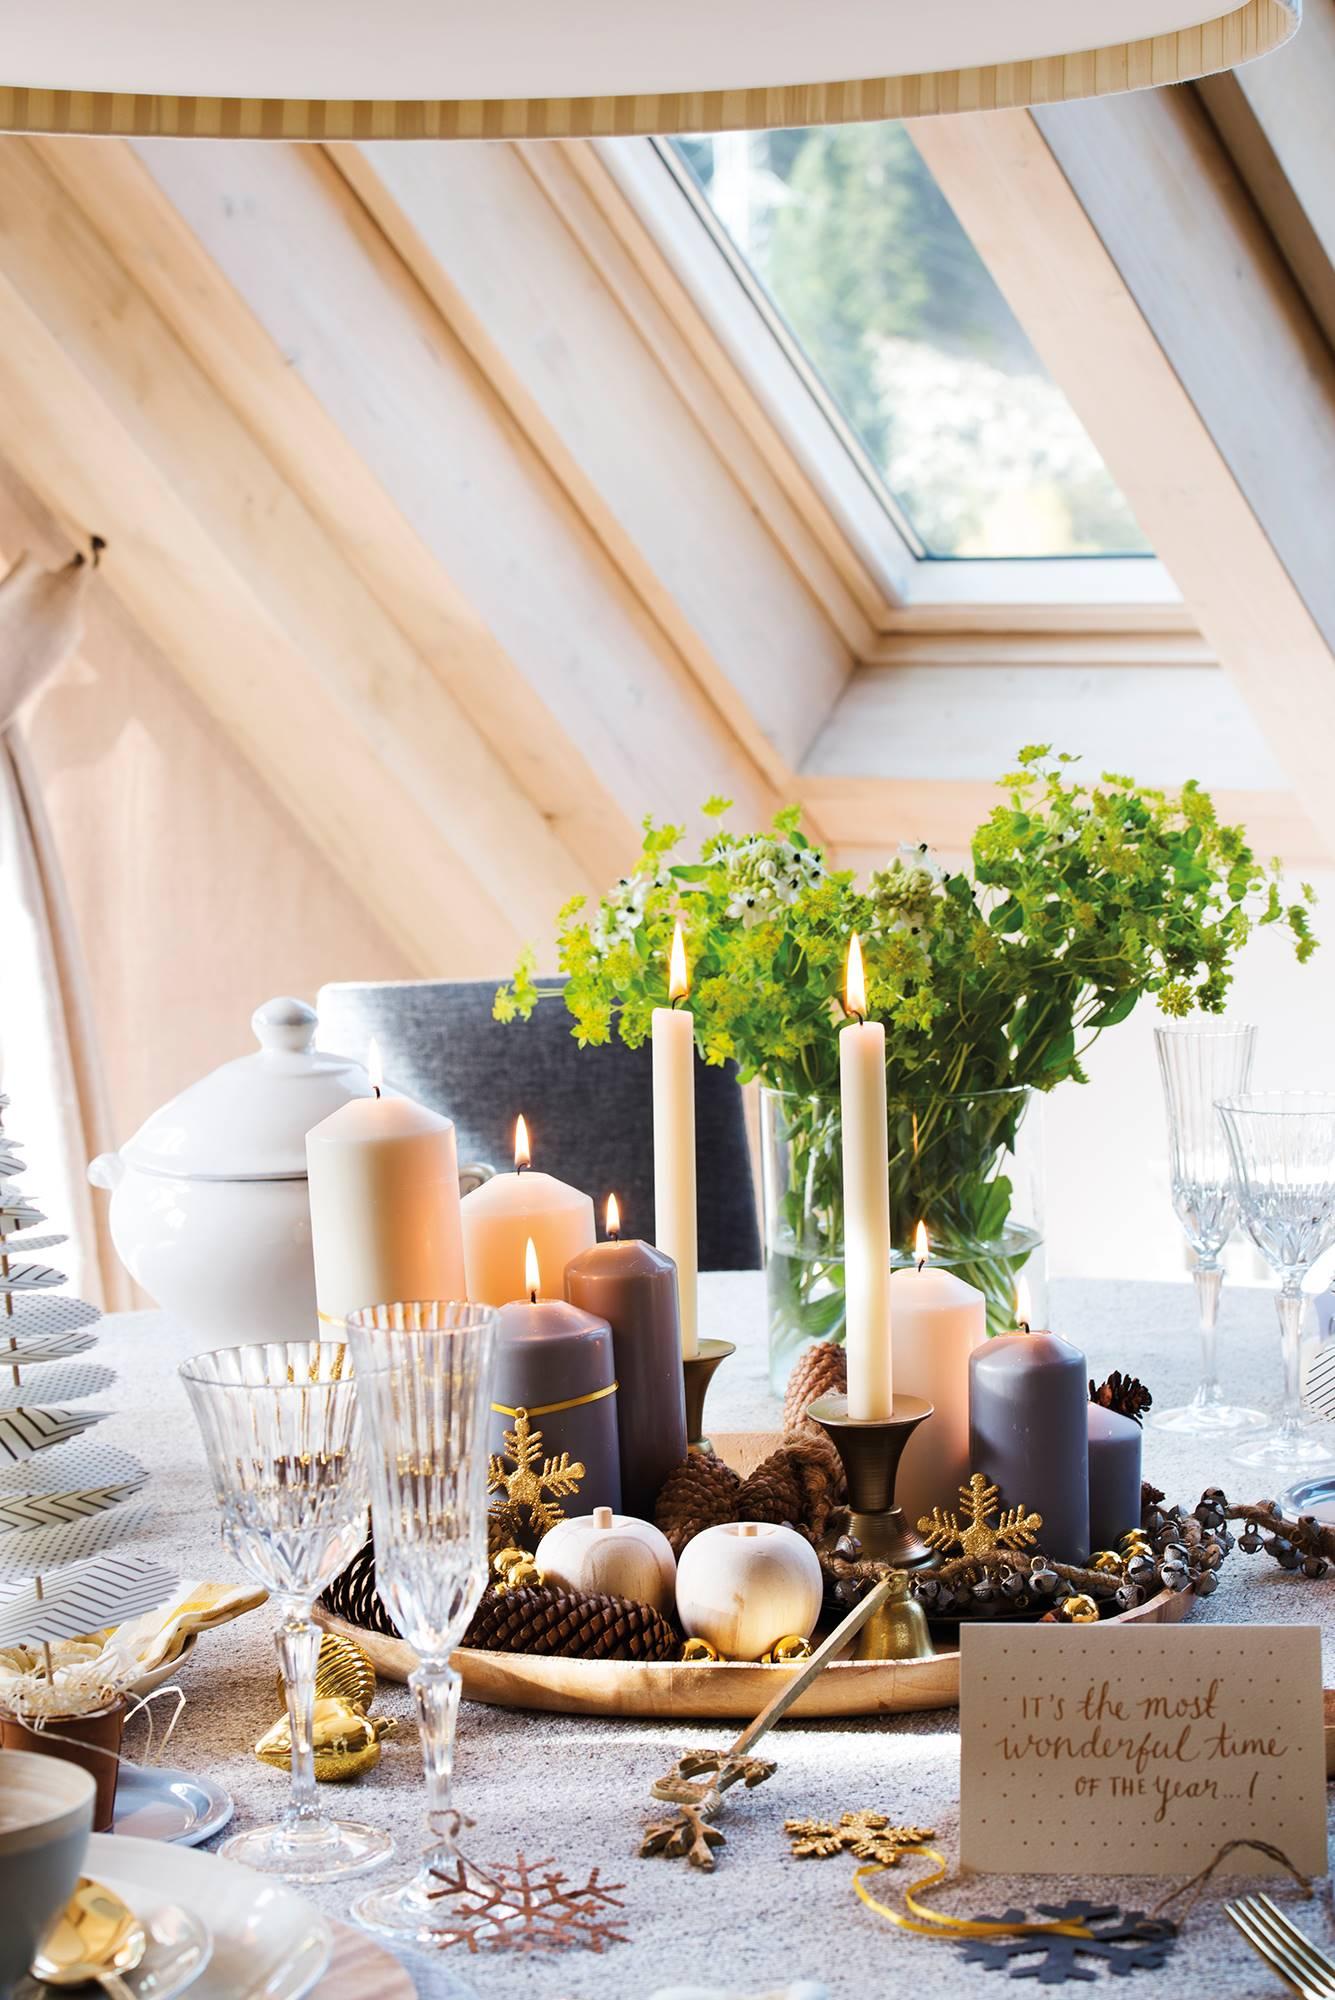 Centros de mesa ideas para decorar la mesa del comedor